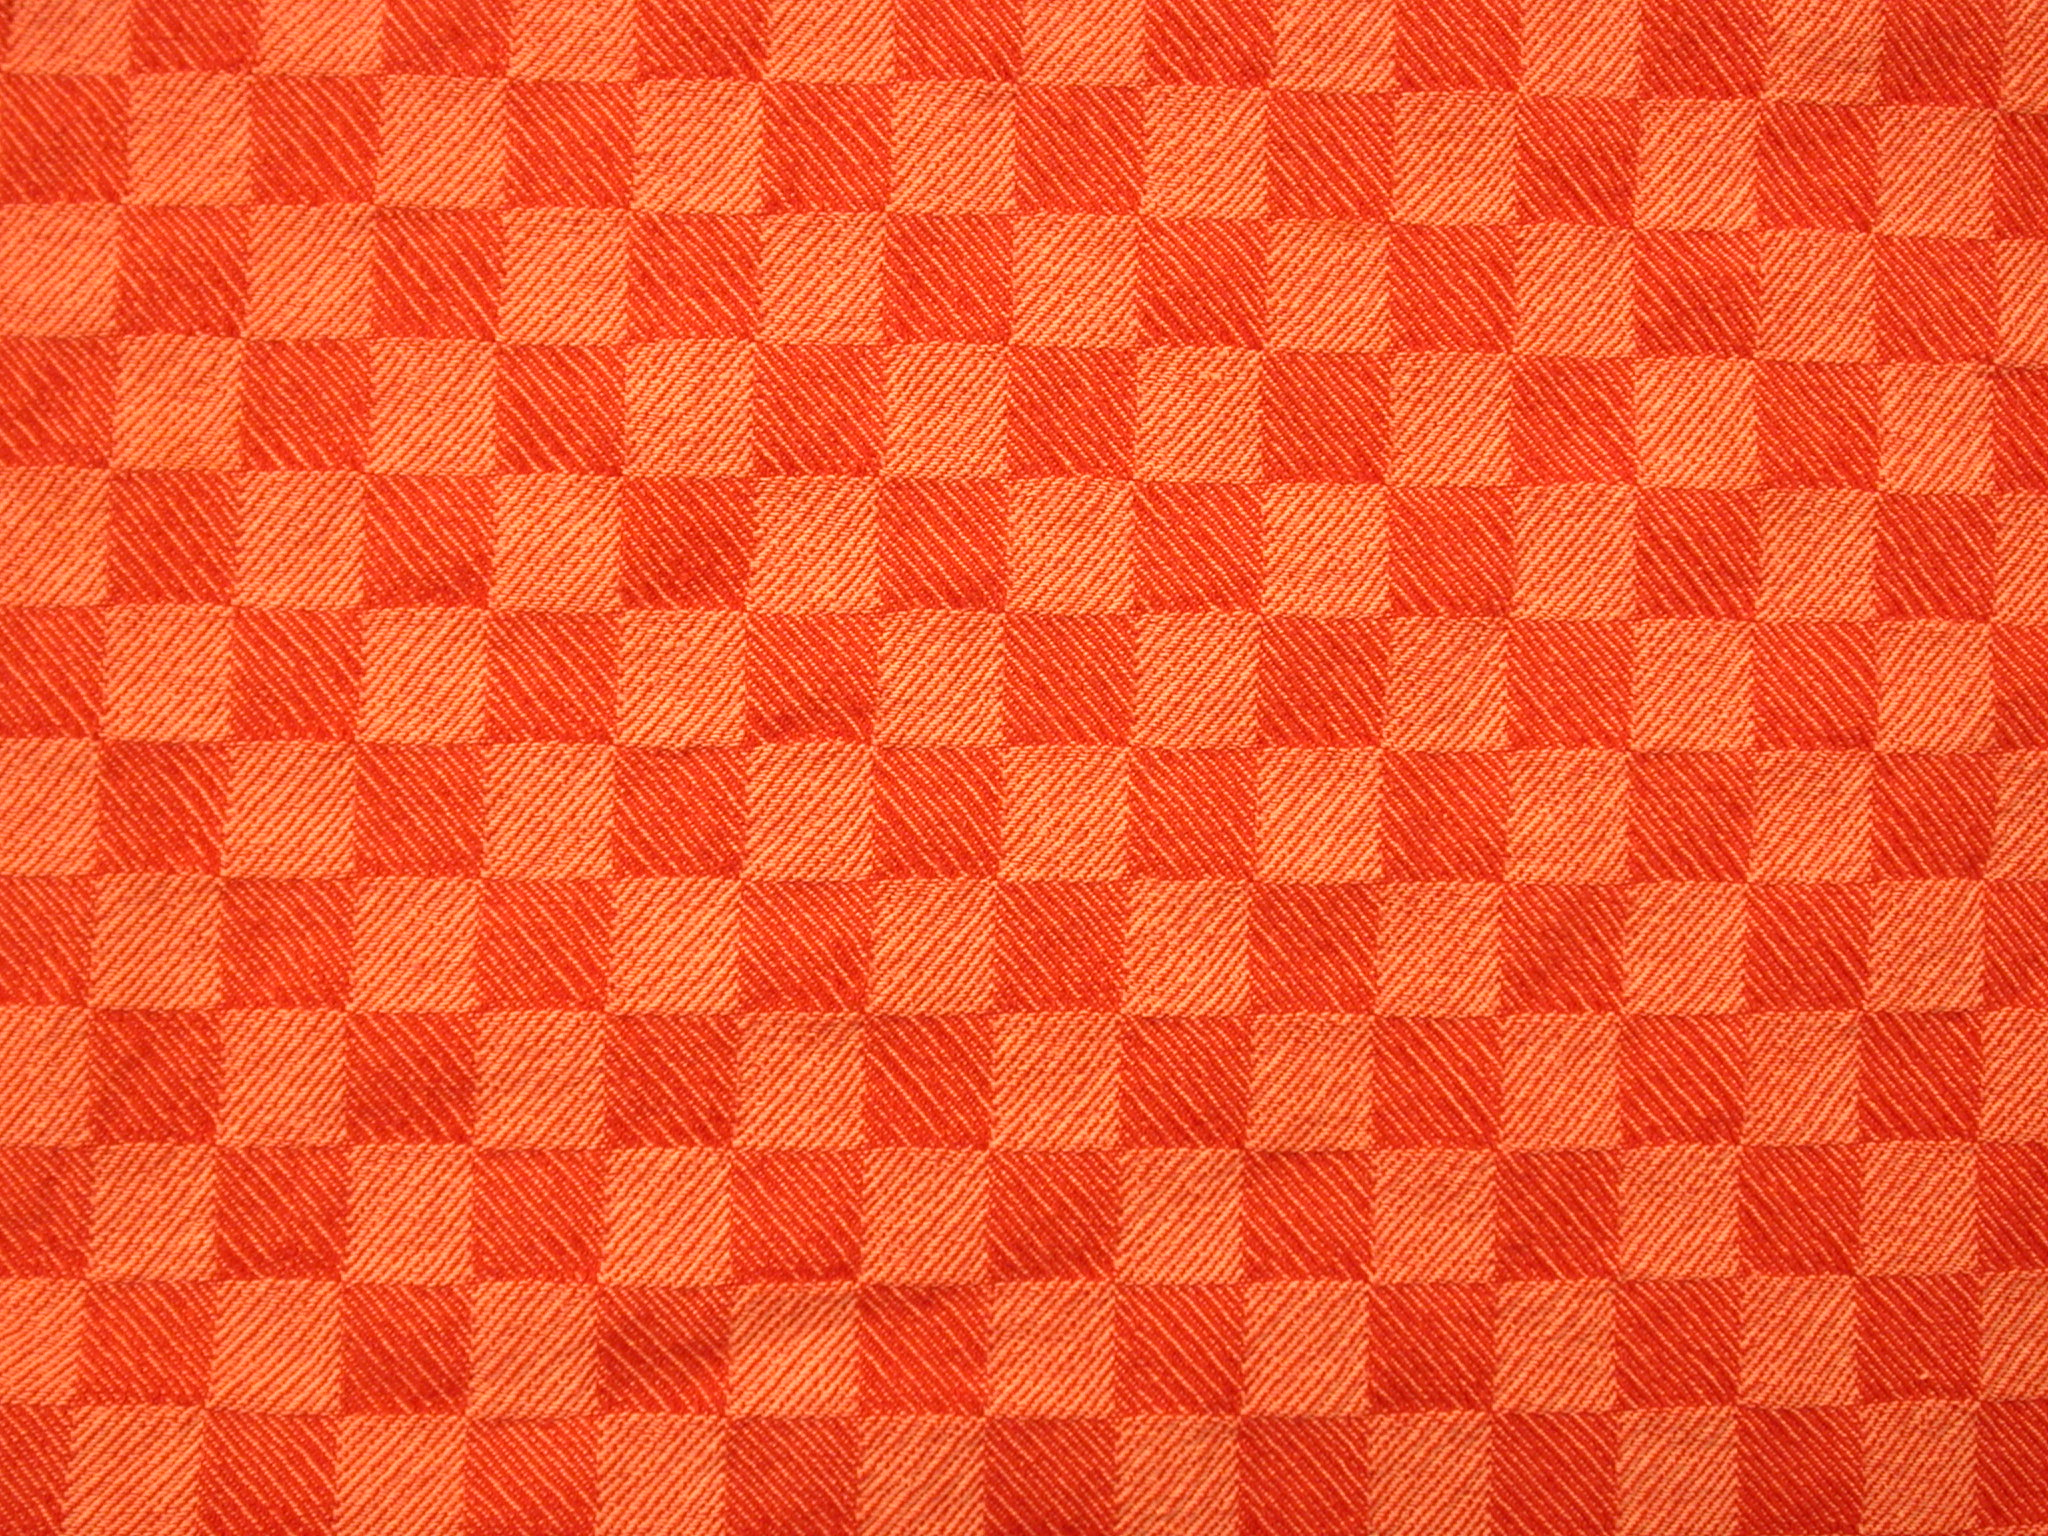 red orange tablecloth square blocks checker pattern